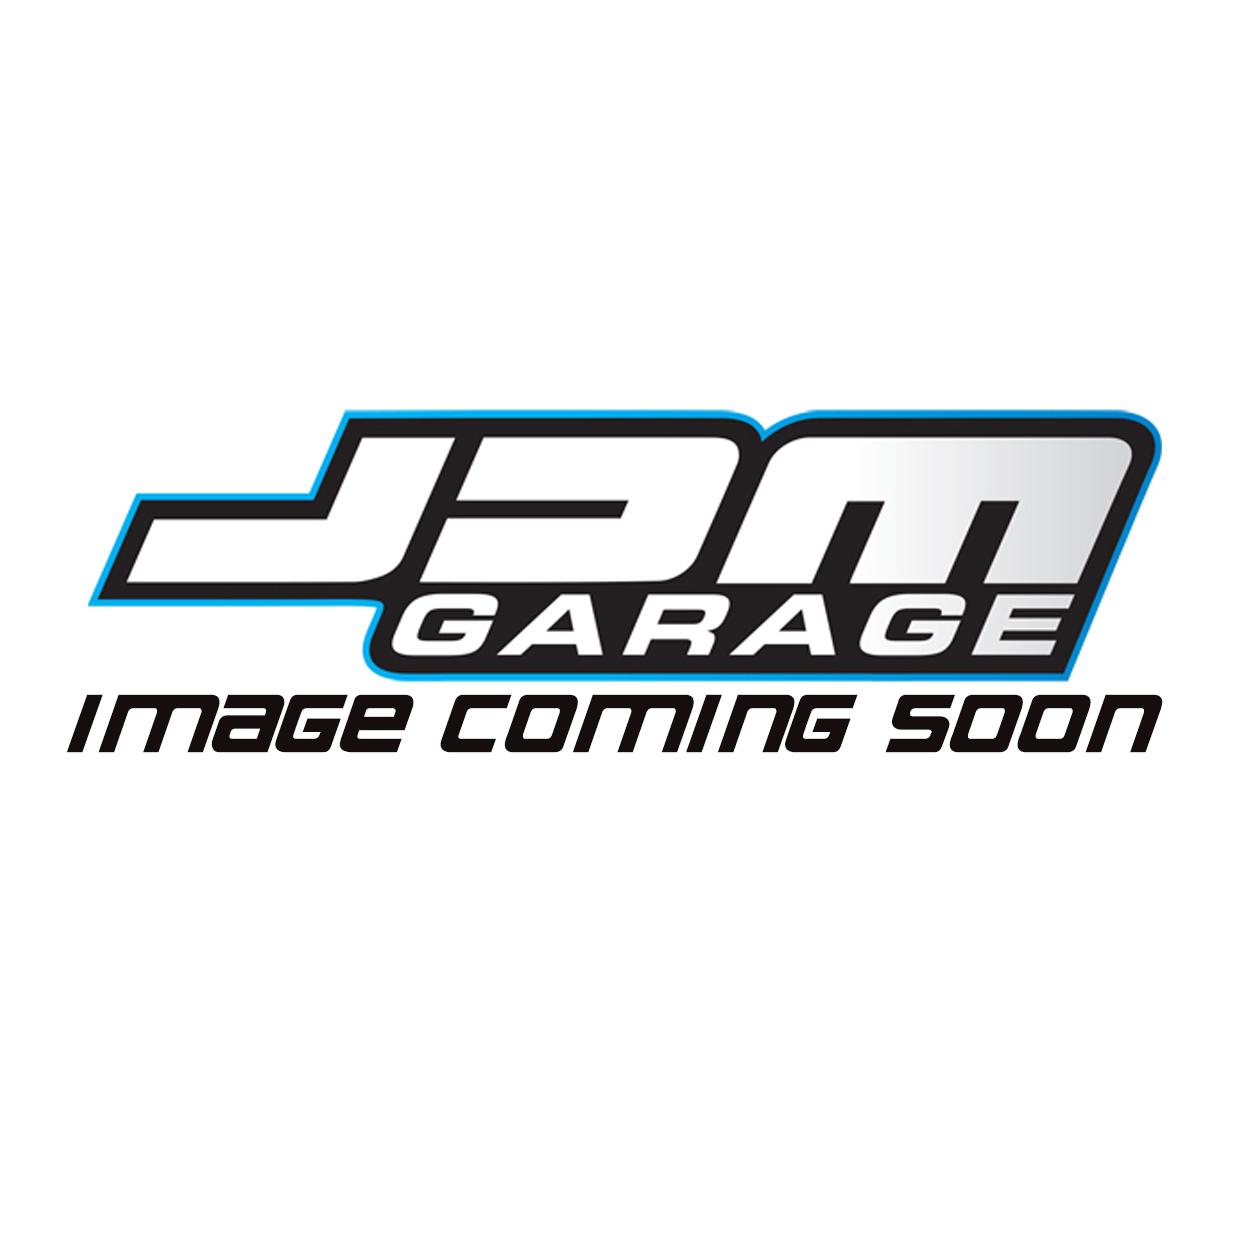 CP Pistons - Honda Civic / Integra / Prelude / S2000 / B16 / B18 / D16 / F20 / H22 / K20